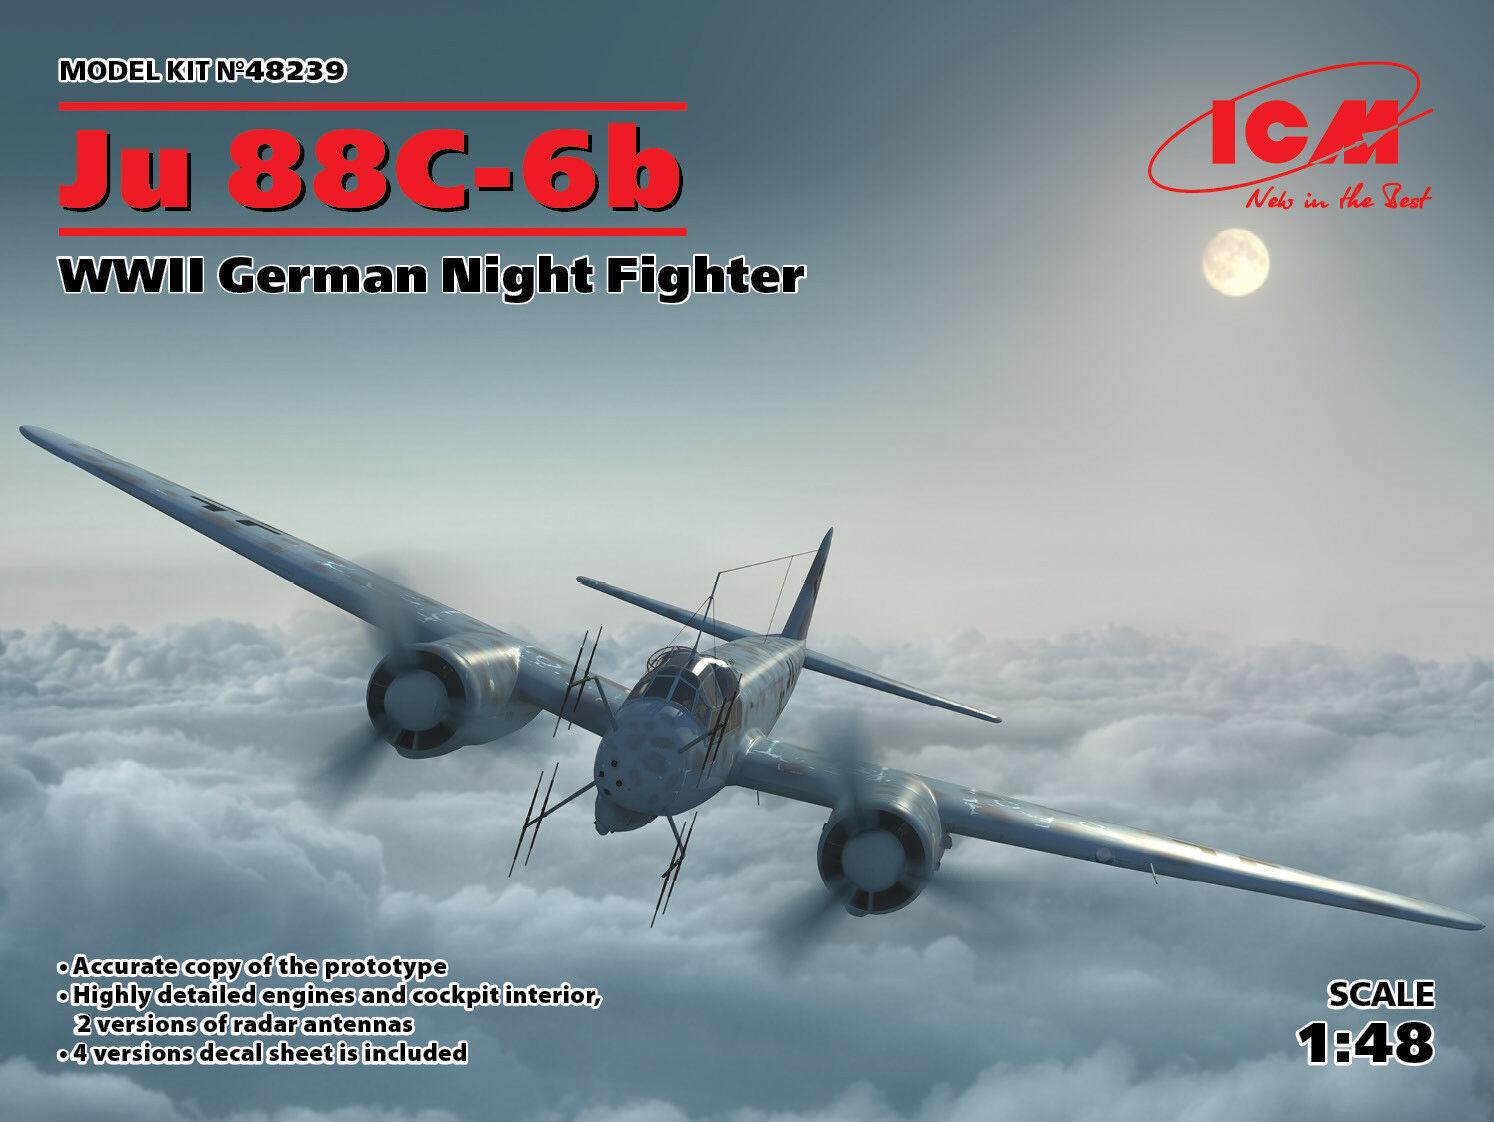 Icm 1 48 Junkers Ju-88C-6b Seconda Guerra Mondiale Tedesco Notte Fighter  48239